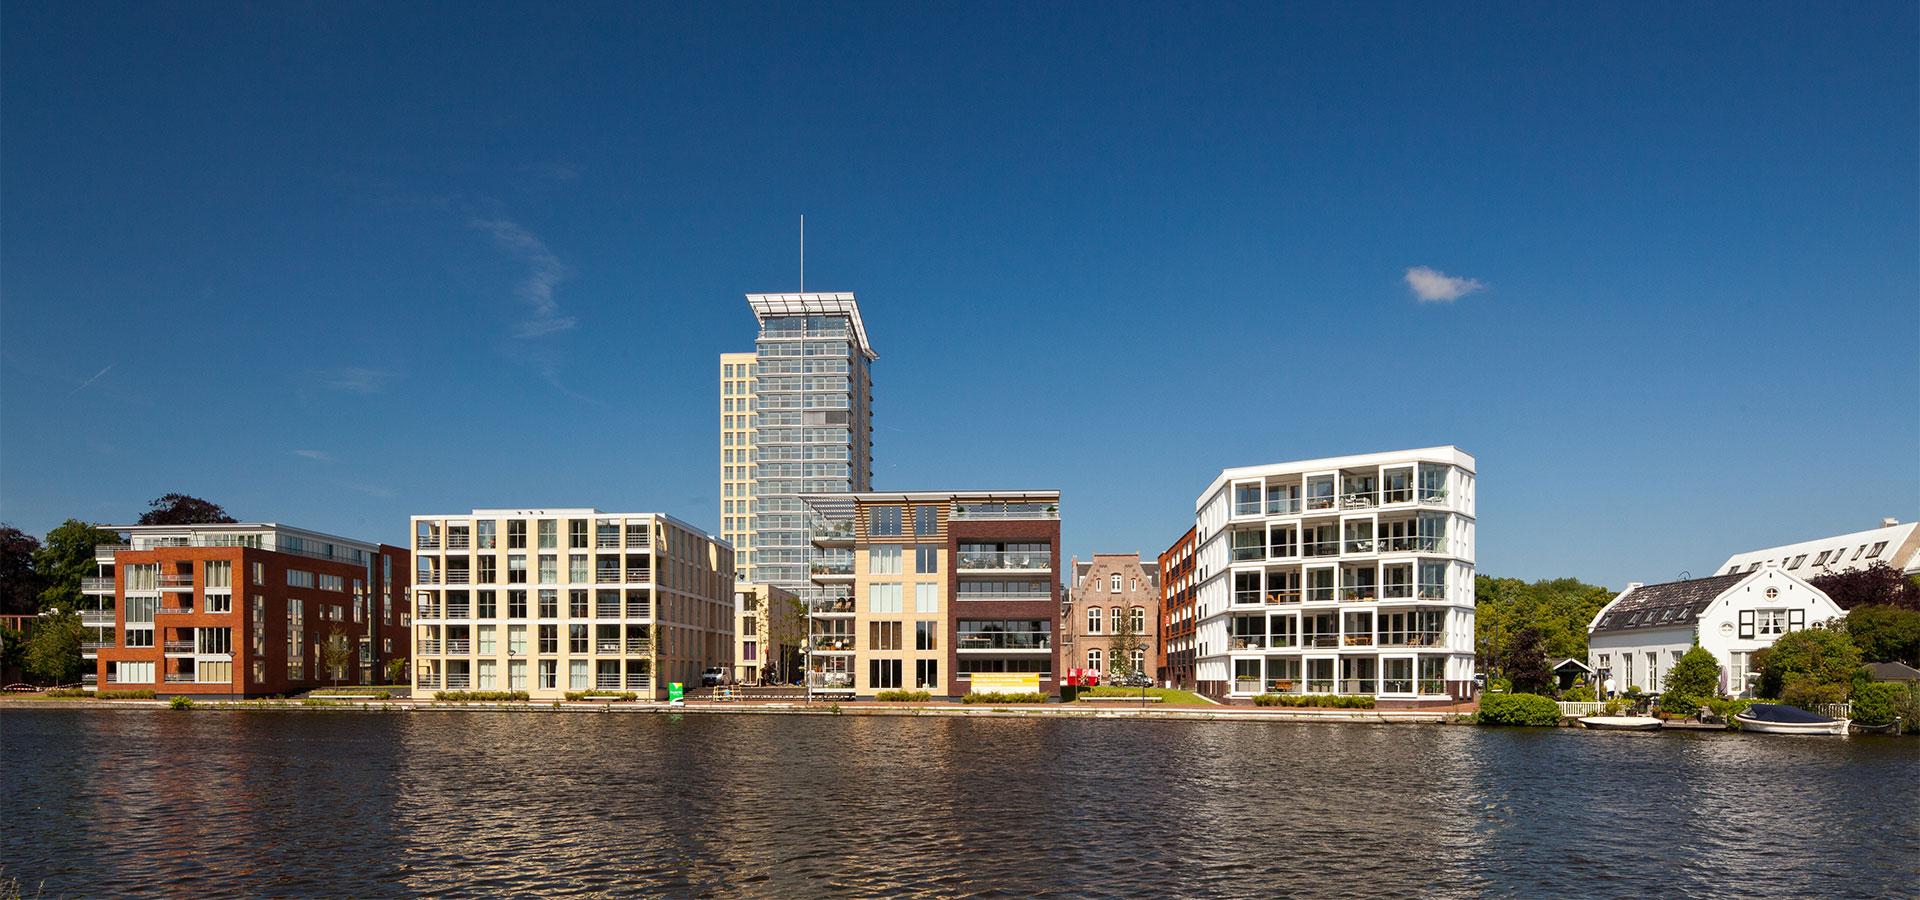 FARO architecten Mariastichting Haarlem 01